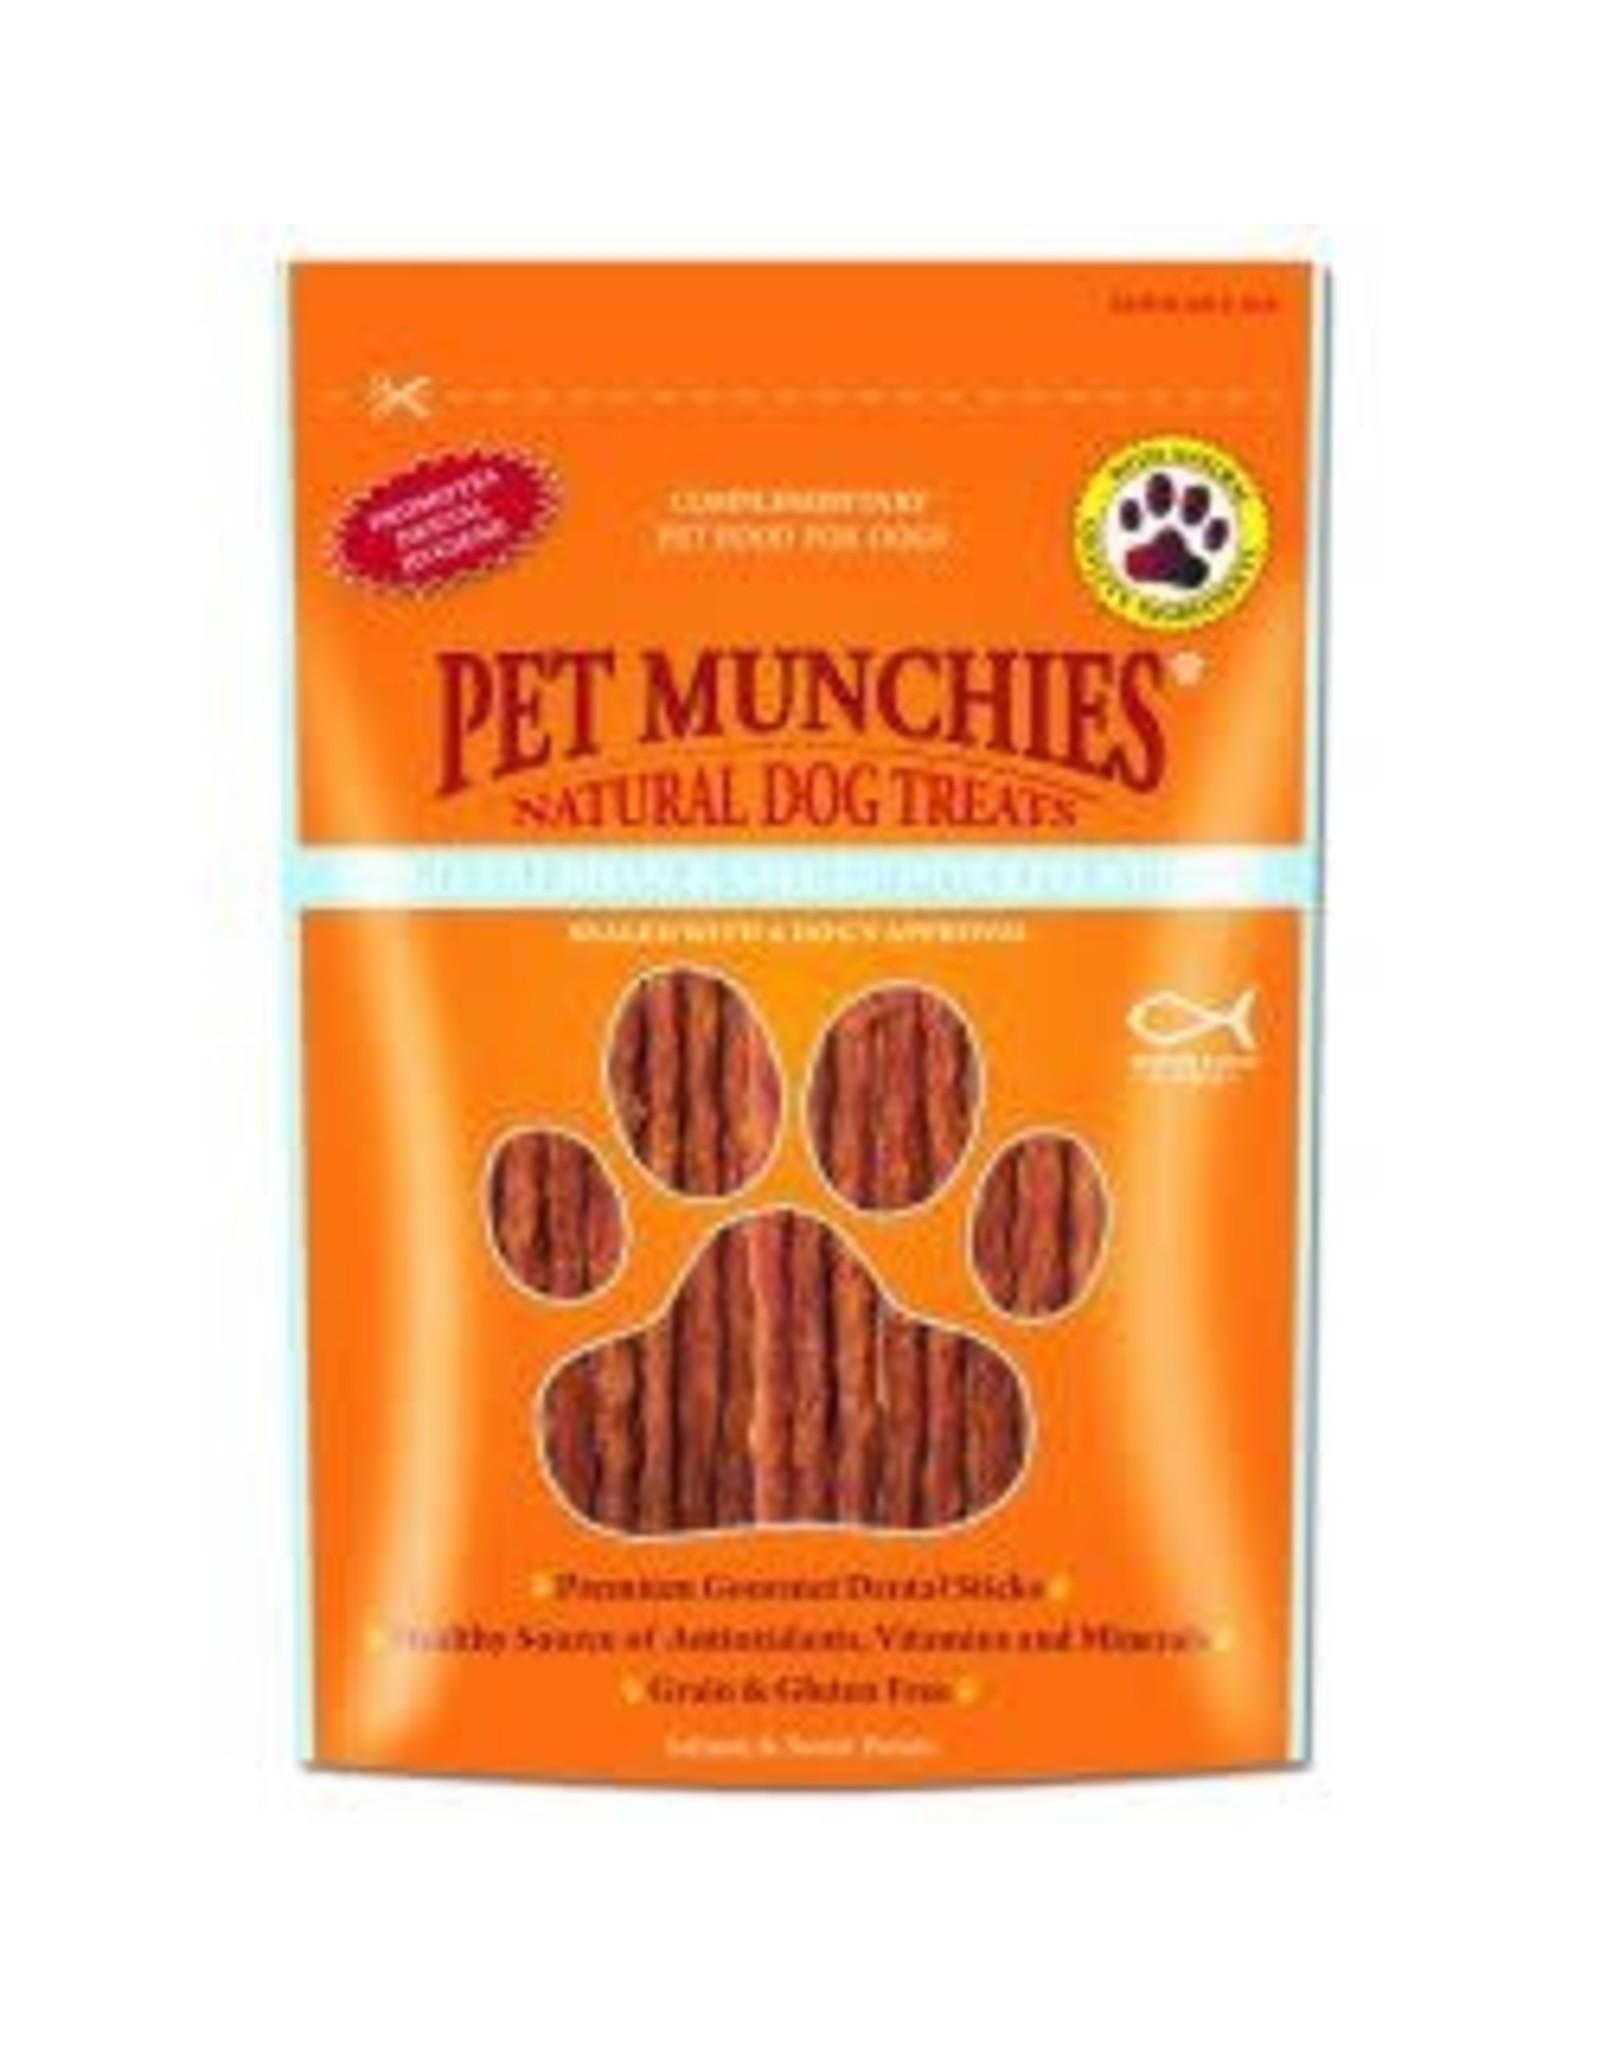 Pet Munchies Pet Munchies Wild Salmon And Sweet Potato Treats 90g